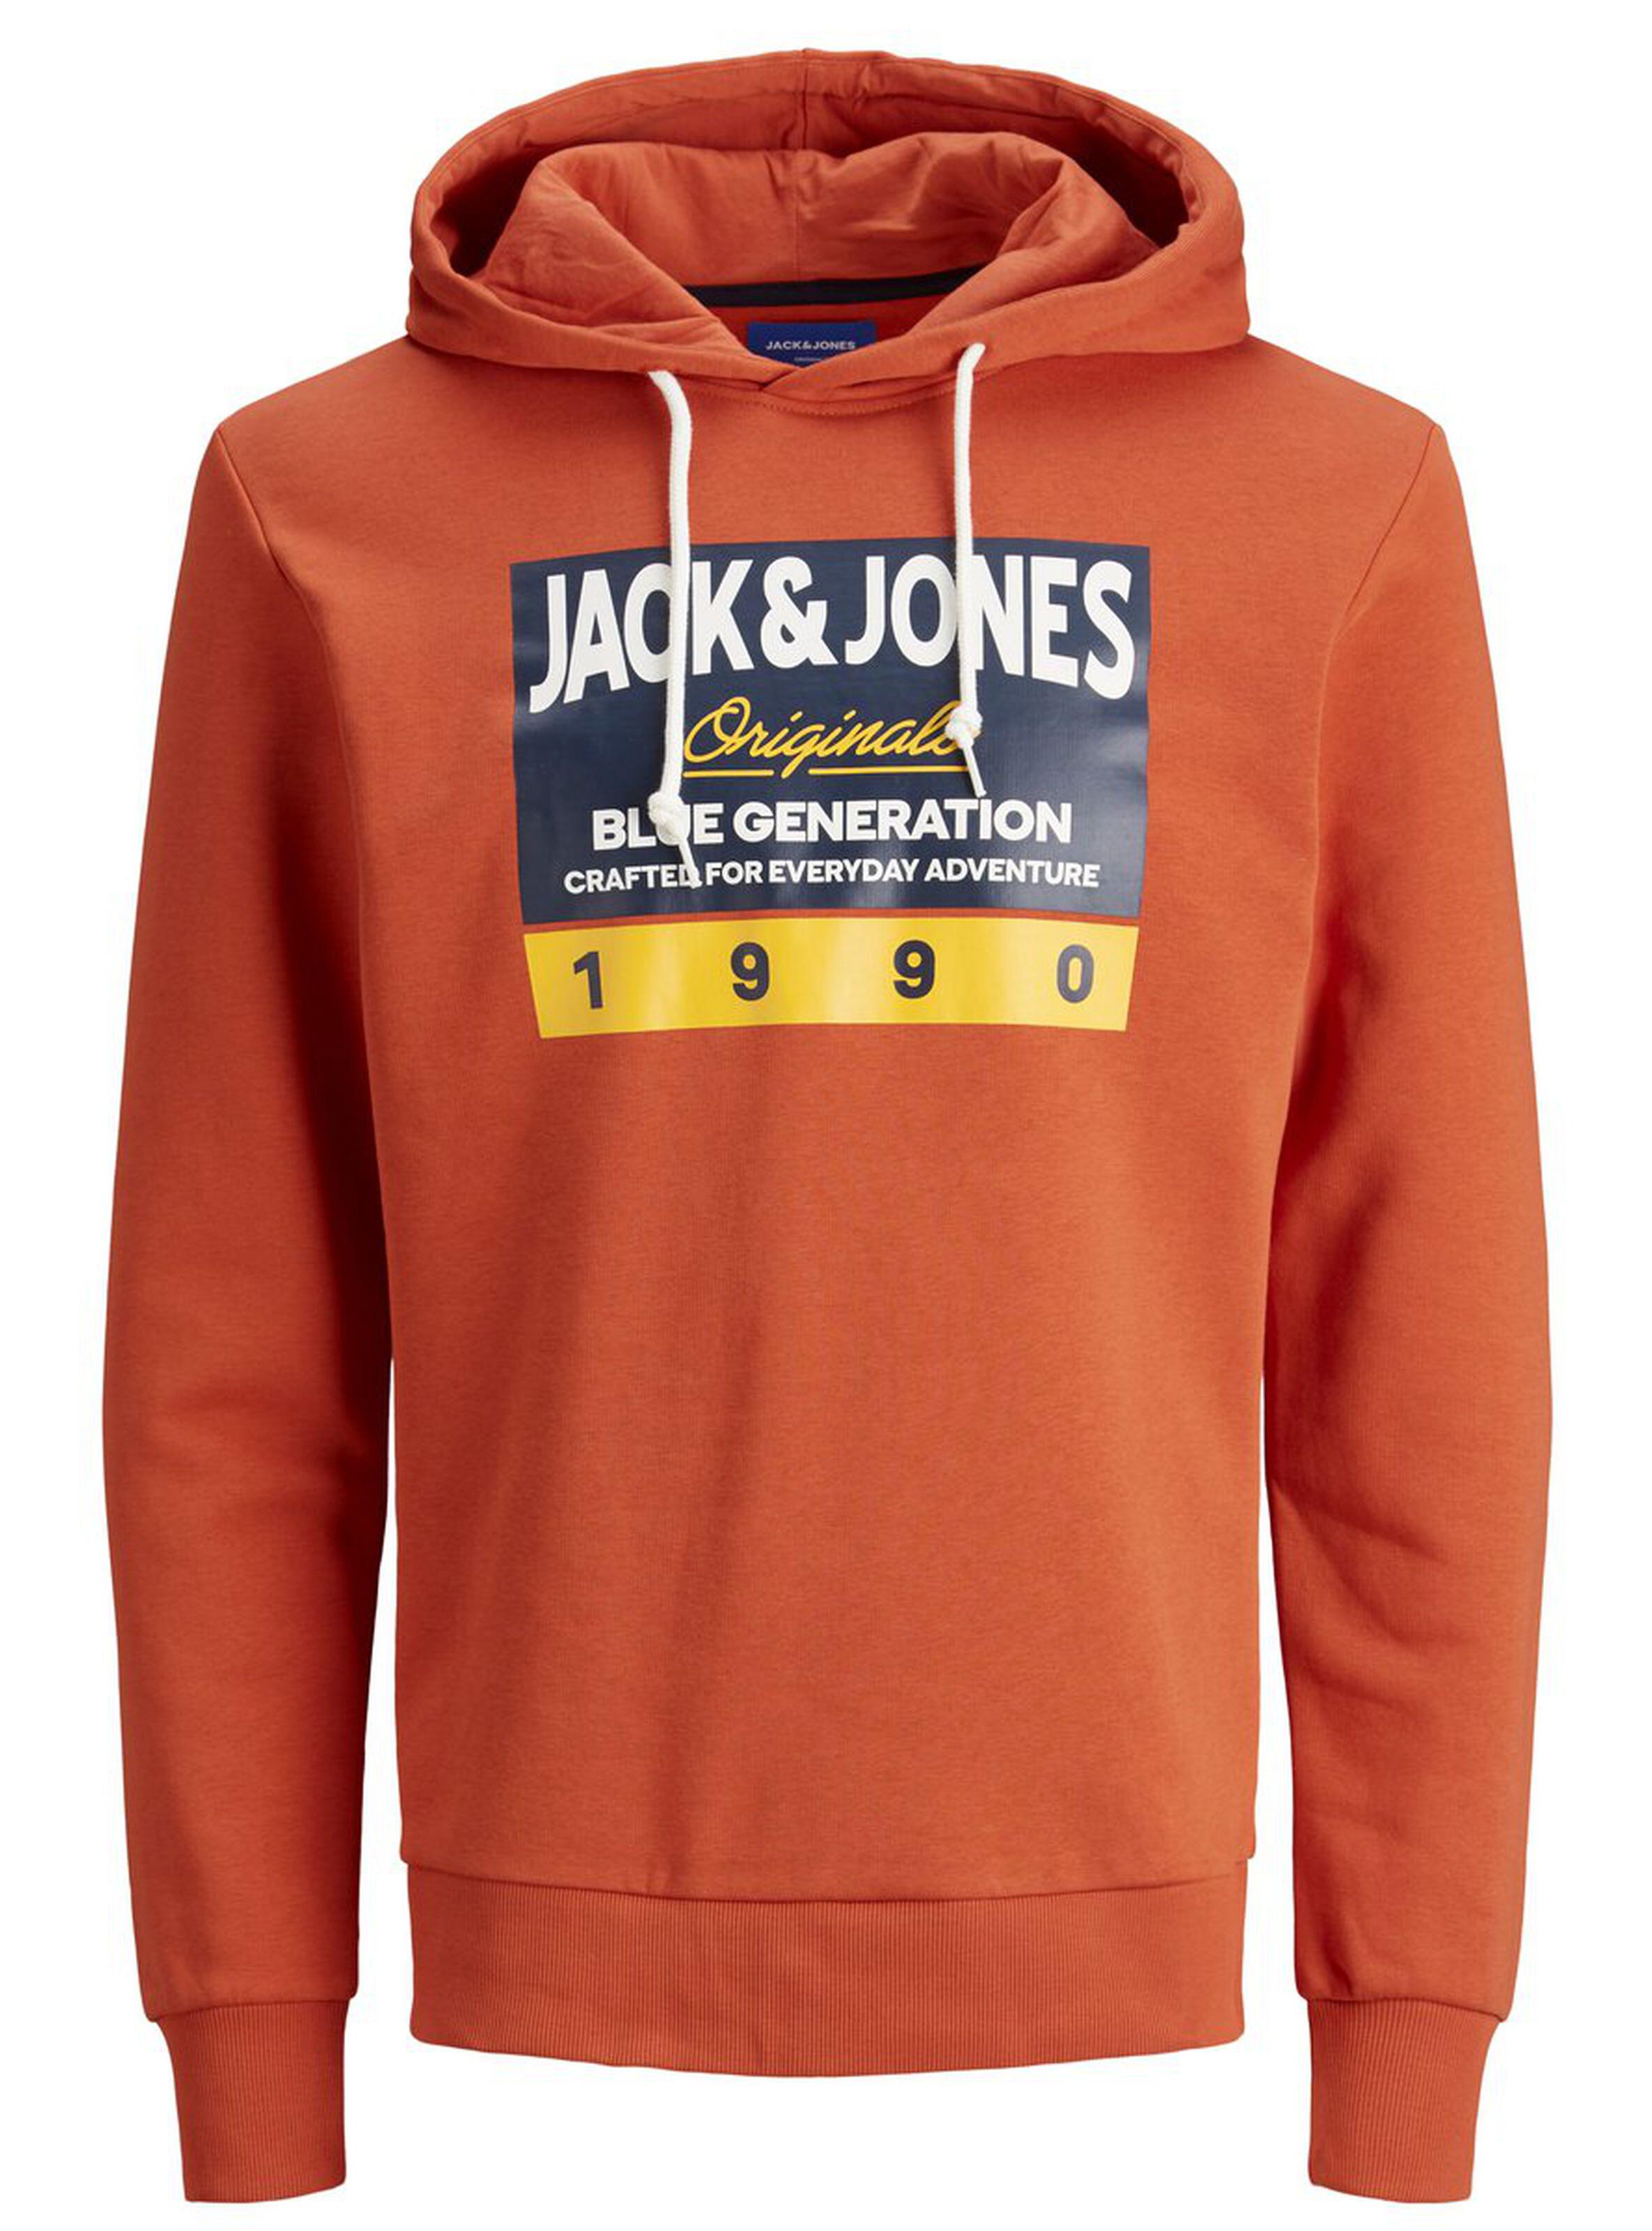 JACK&JONES 3.999 rsd